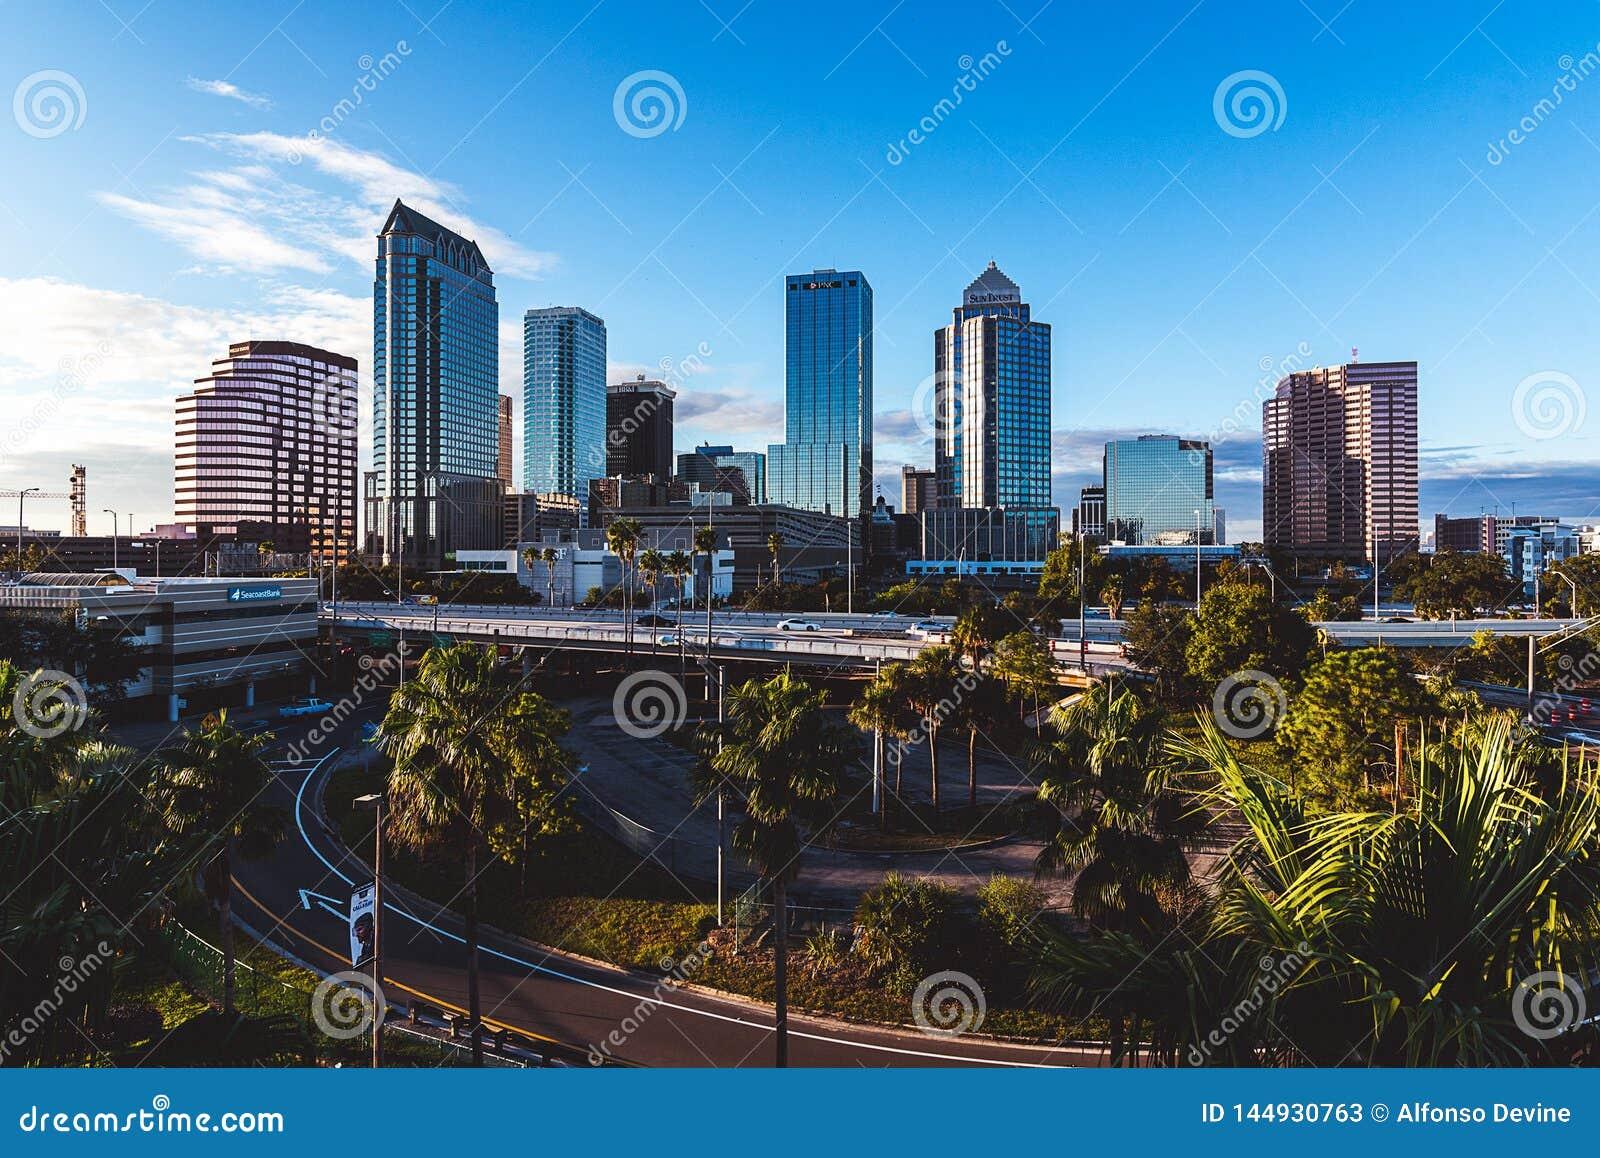 Bright City 1